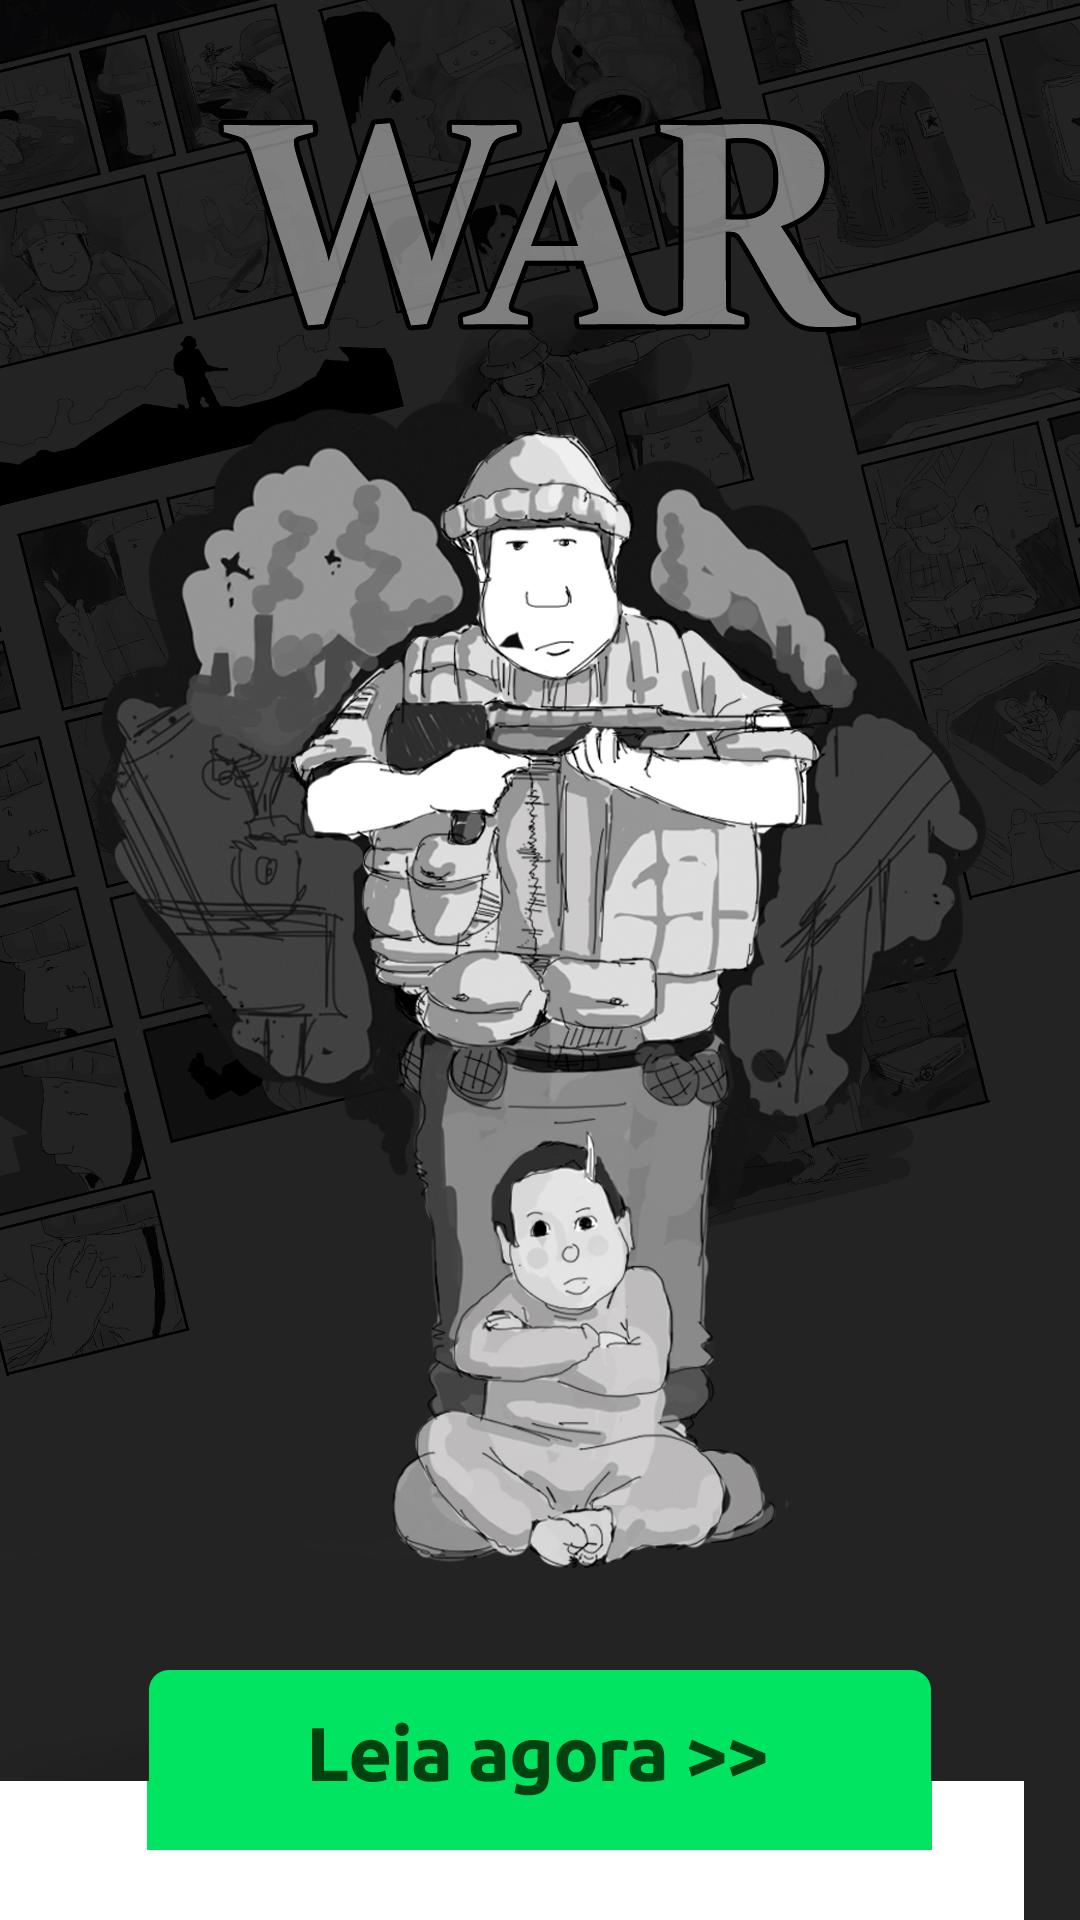 2021_08_14_green_comics_site_home_capas_graphic_war